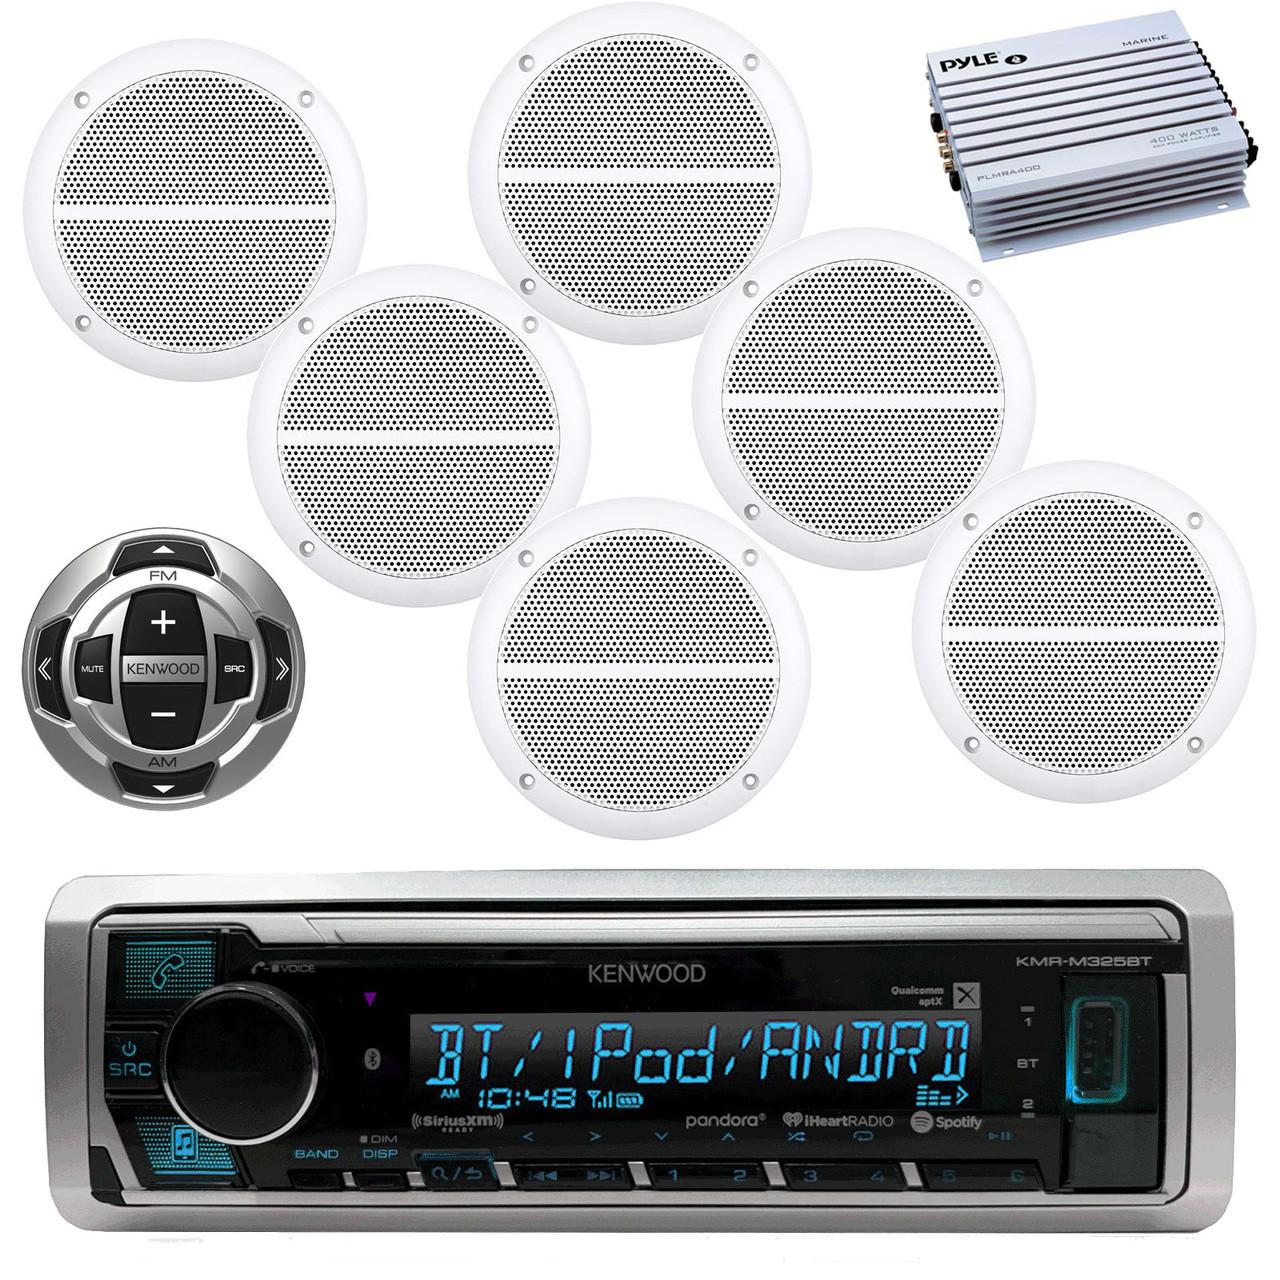 hight resolution of kenwood marine digital media bluetooth receiver 6x enrock marine 6 5 weather resistant speakers white pyle 4 channel waterproof amplifier white